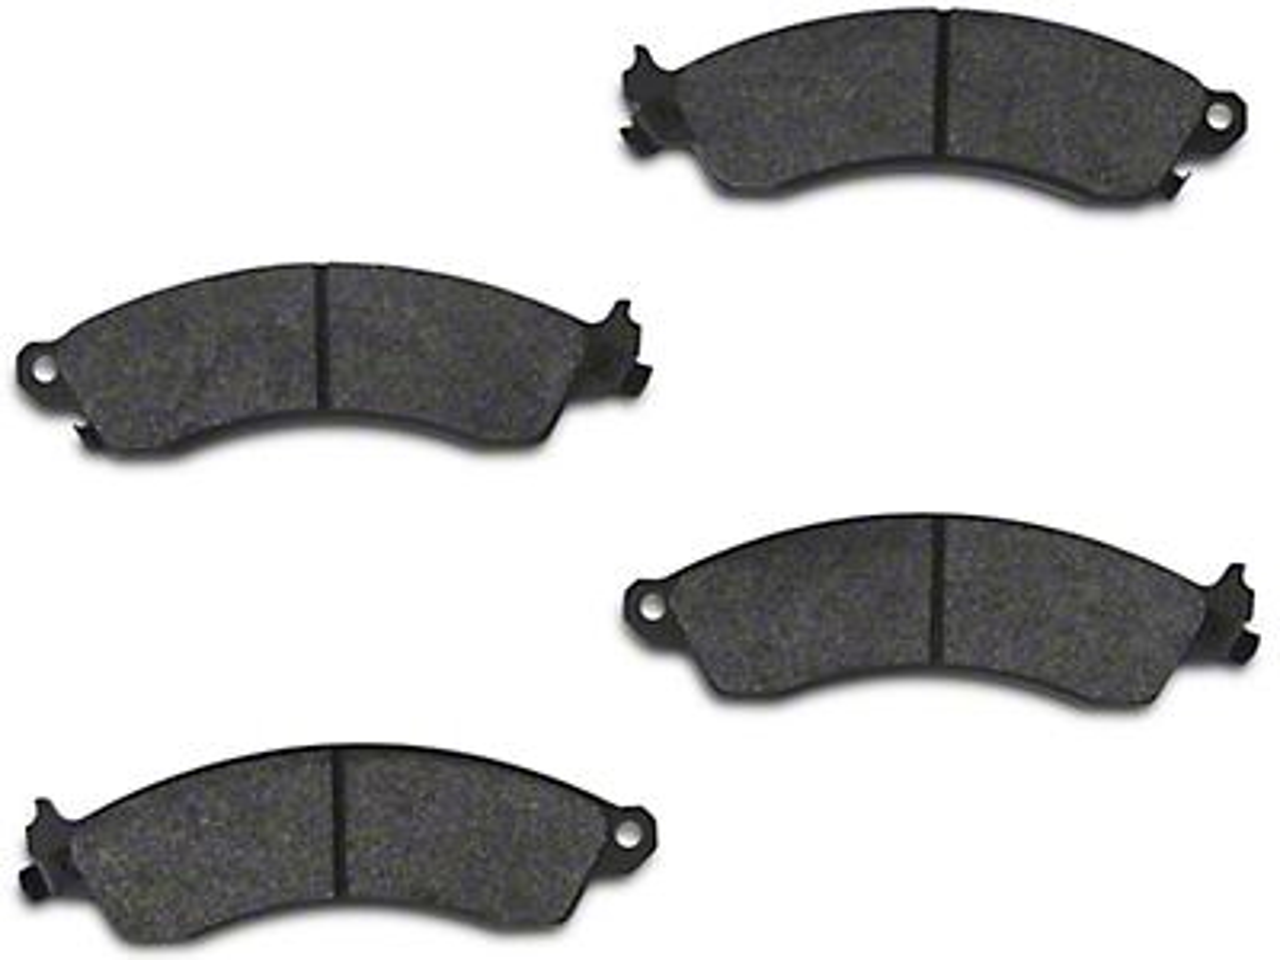 Xtreme Stop Performance Ceramic Brake Pads - Front Pair (94-04 Bullitt, Mach 1, Cobra)